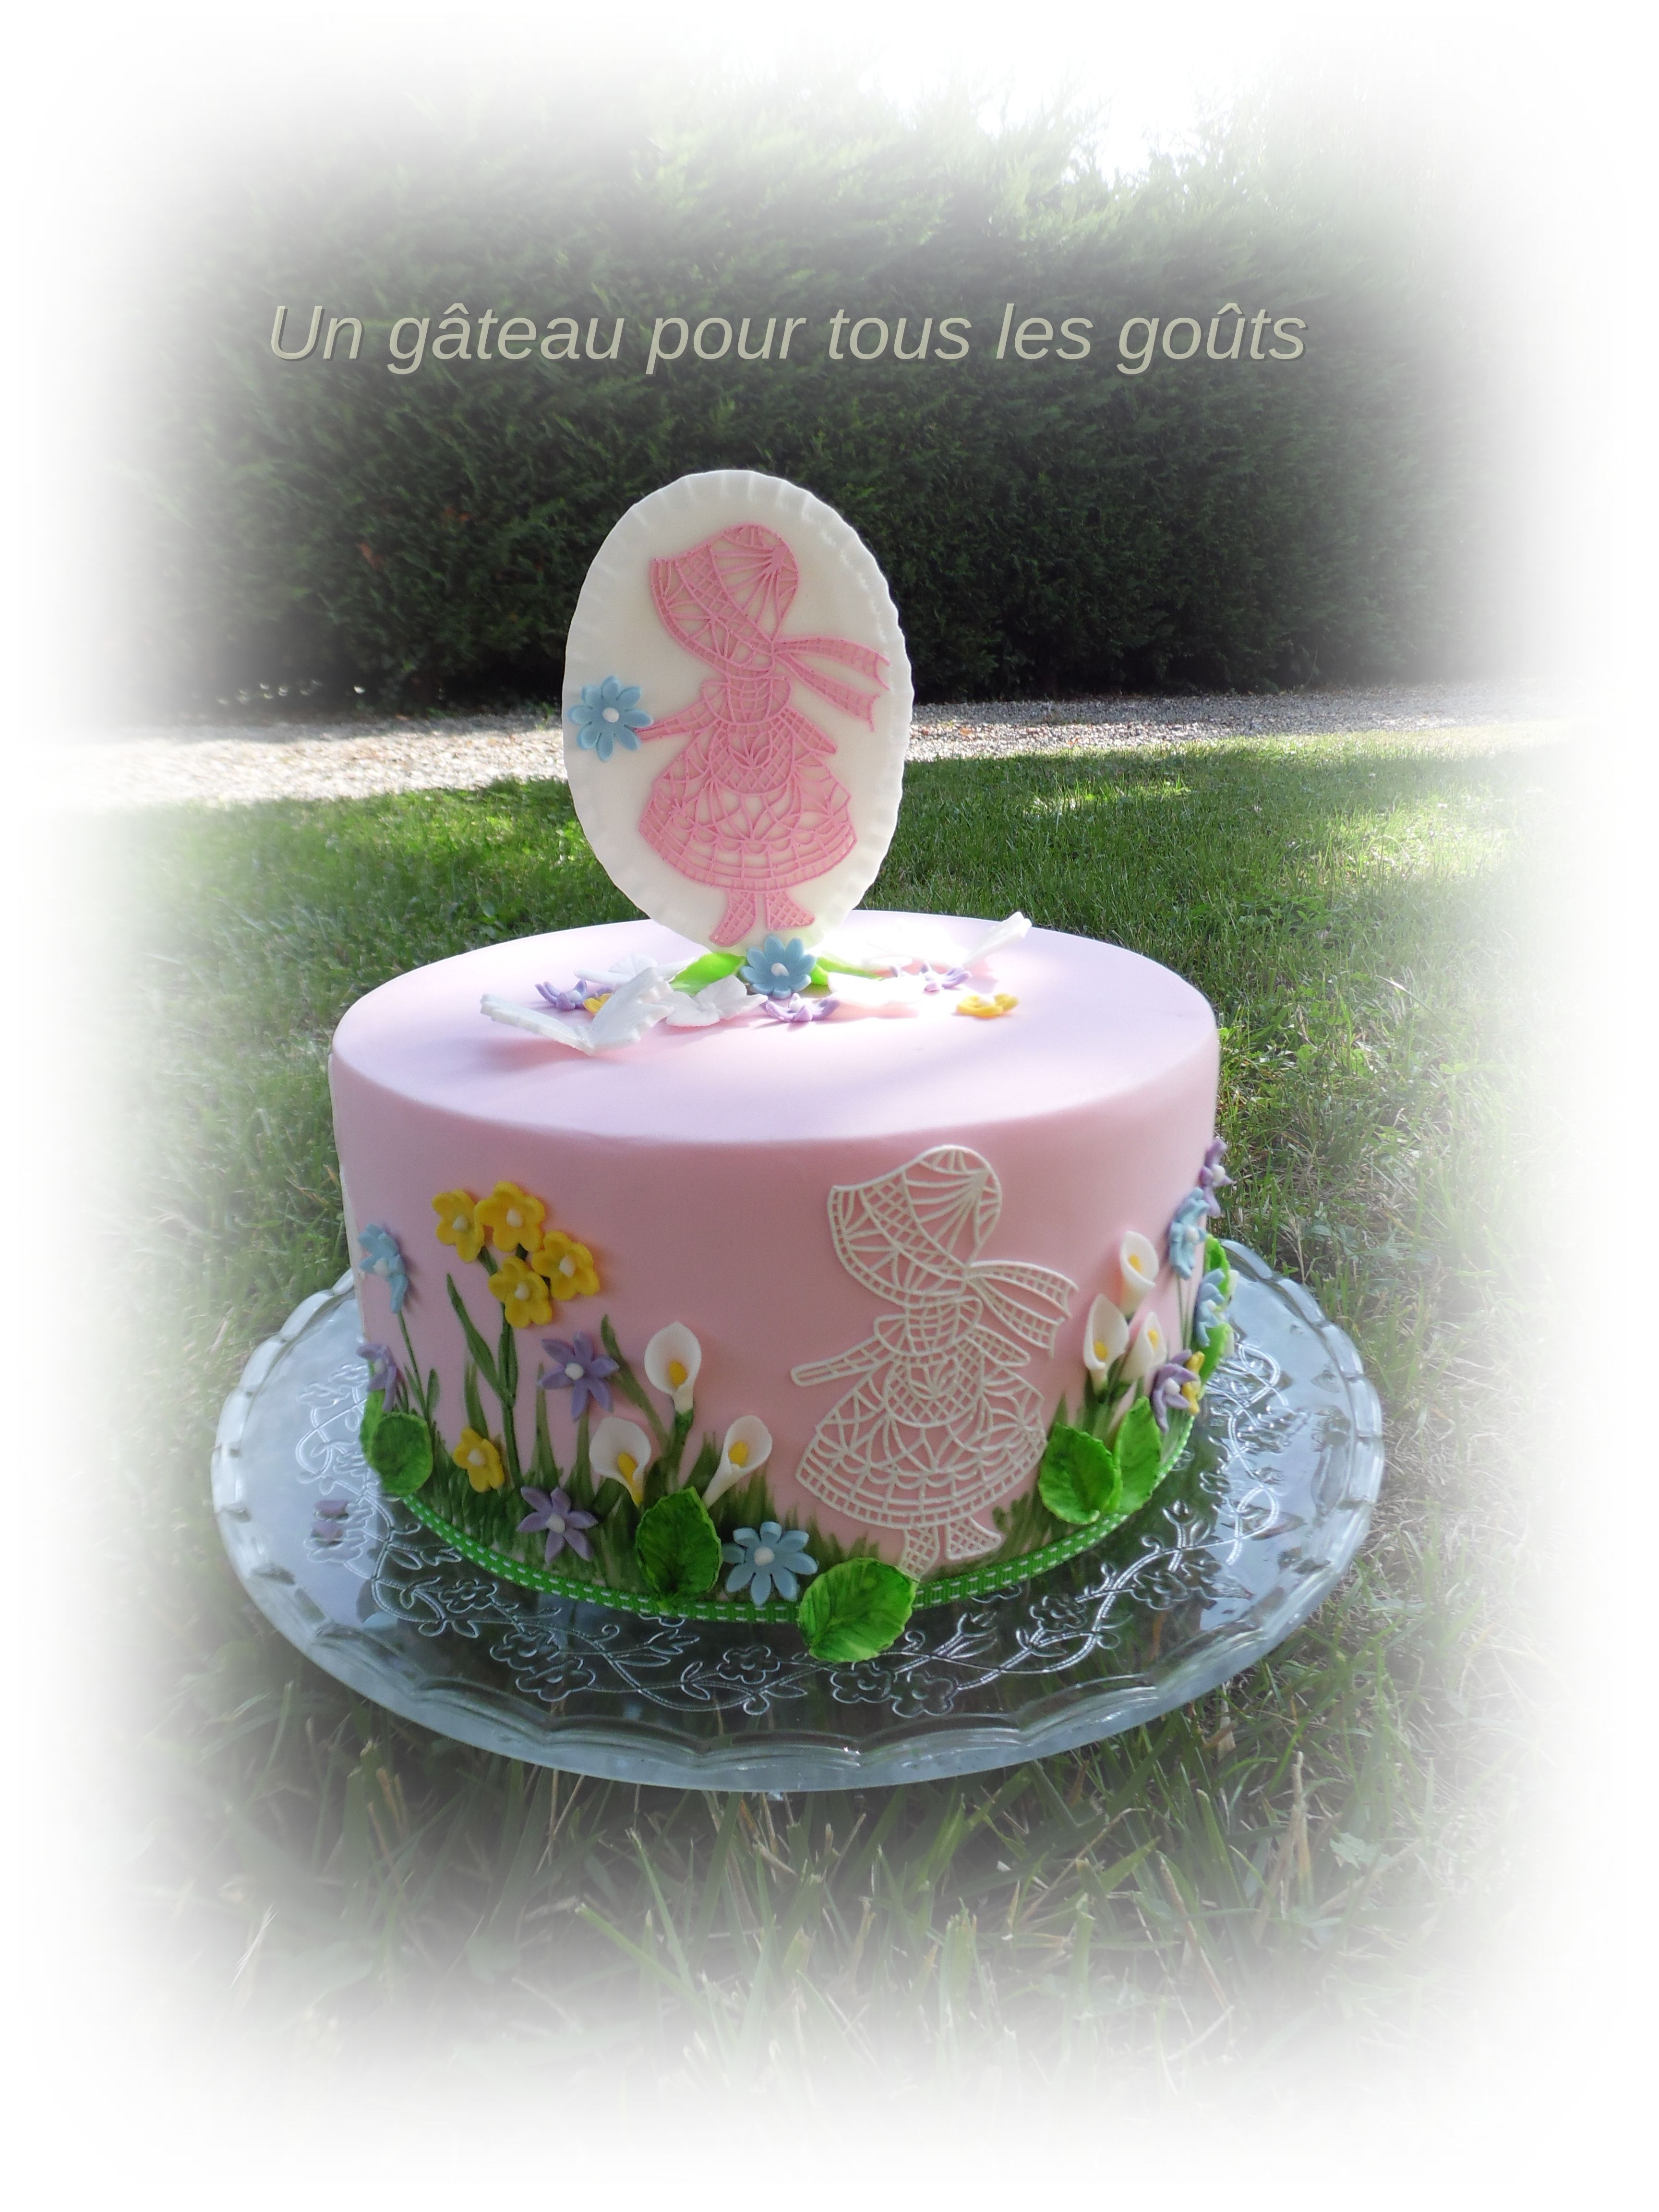 cake champ tre fille wedding cake anniversaire cake g teaux torta de cumplea os wedding. Black Bedroom Furniture Sets. Home Design Ideas